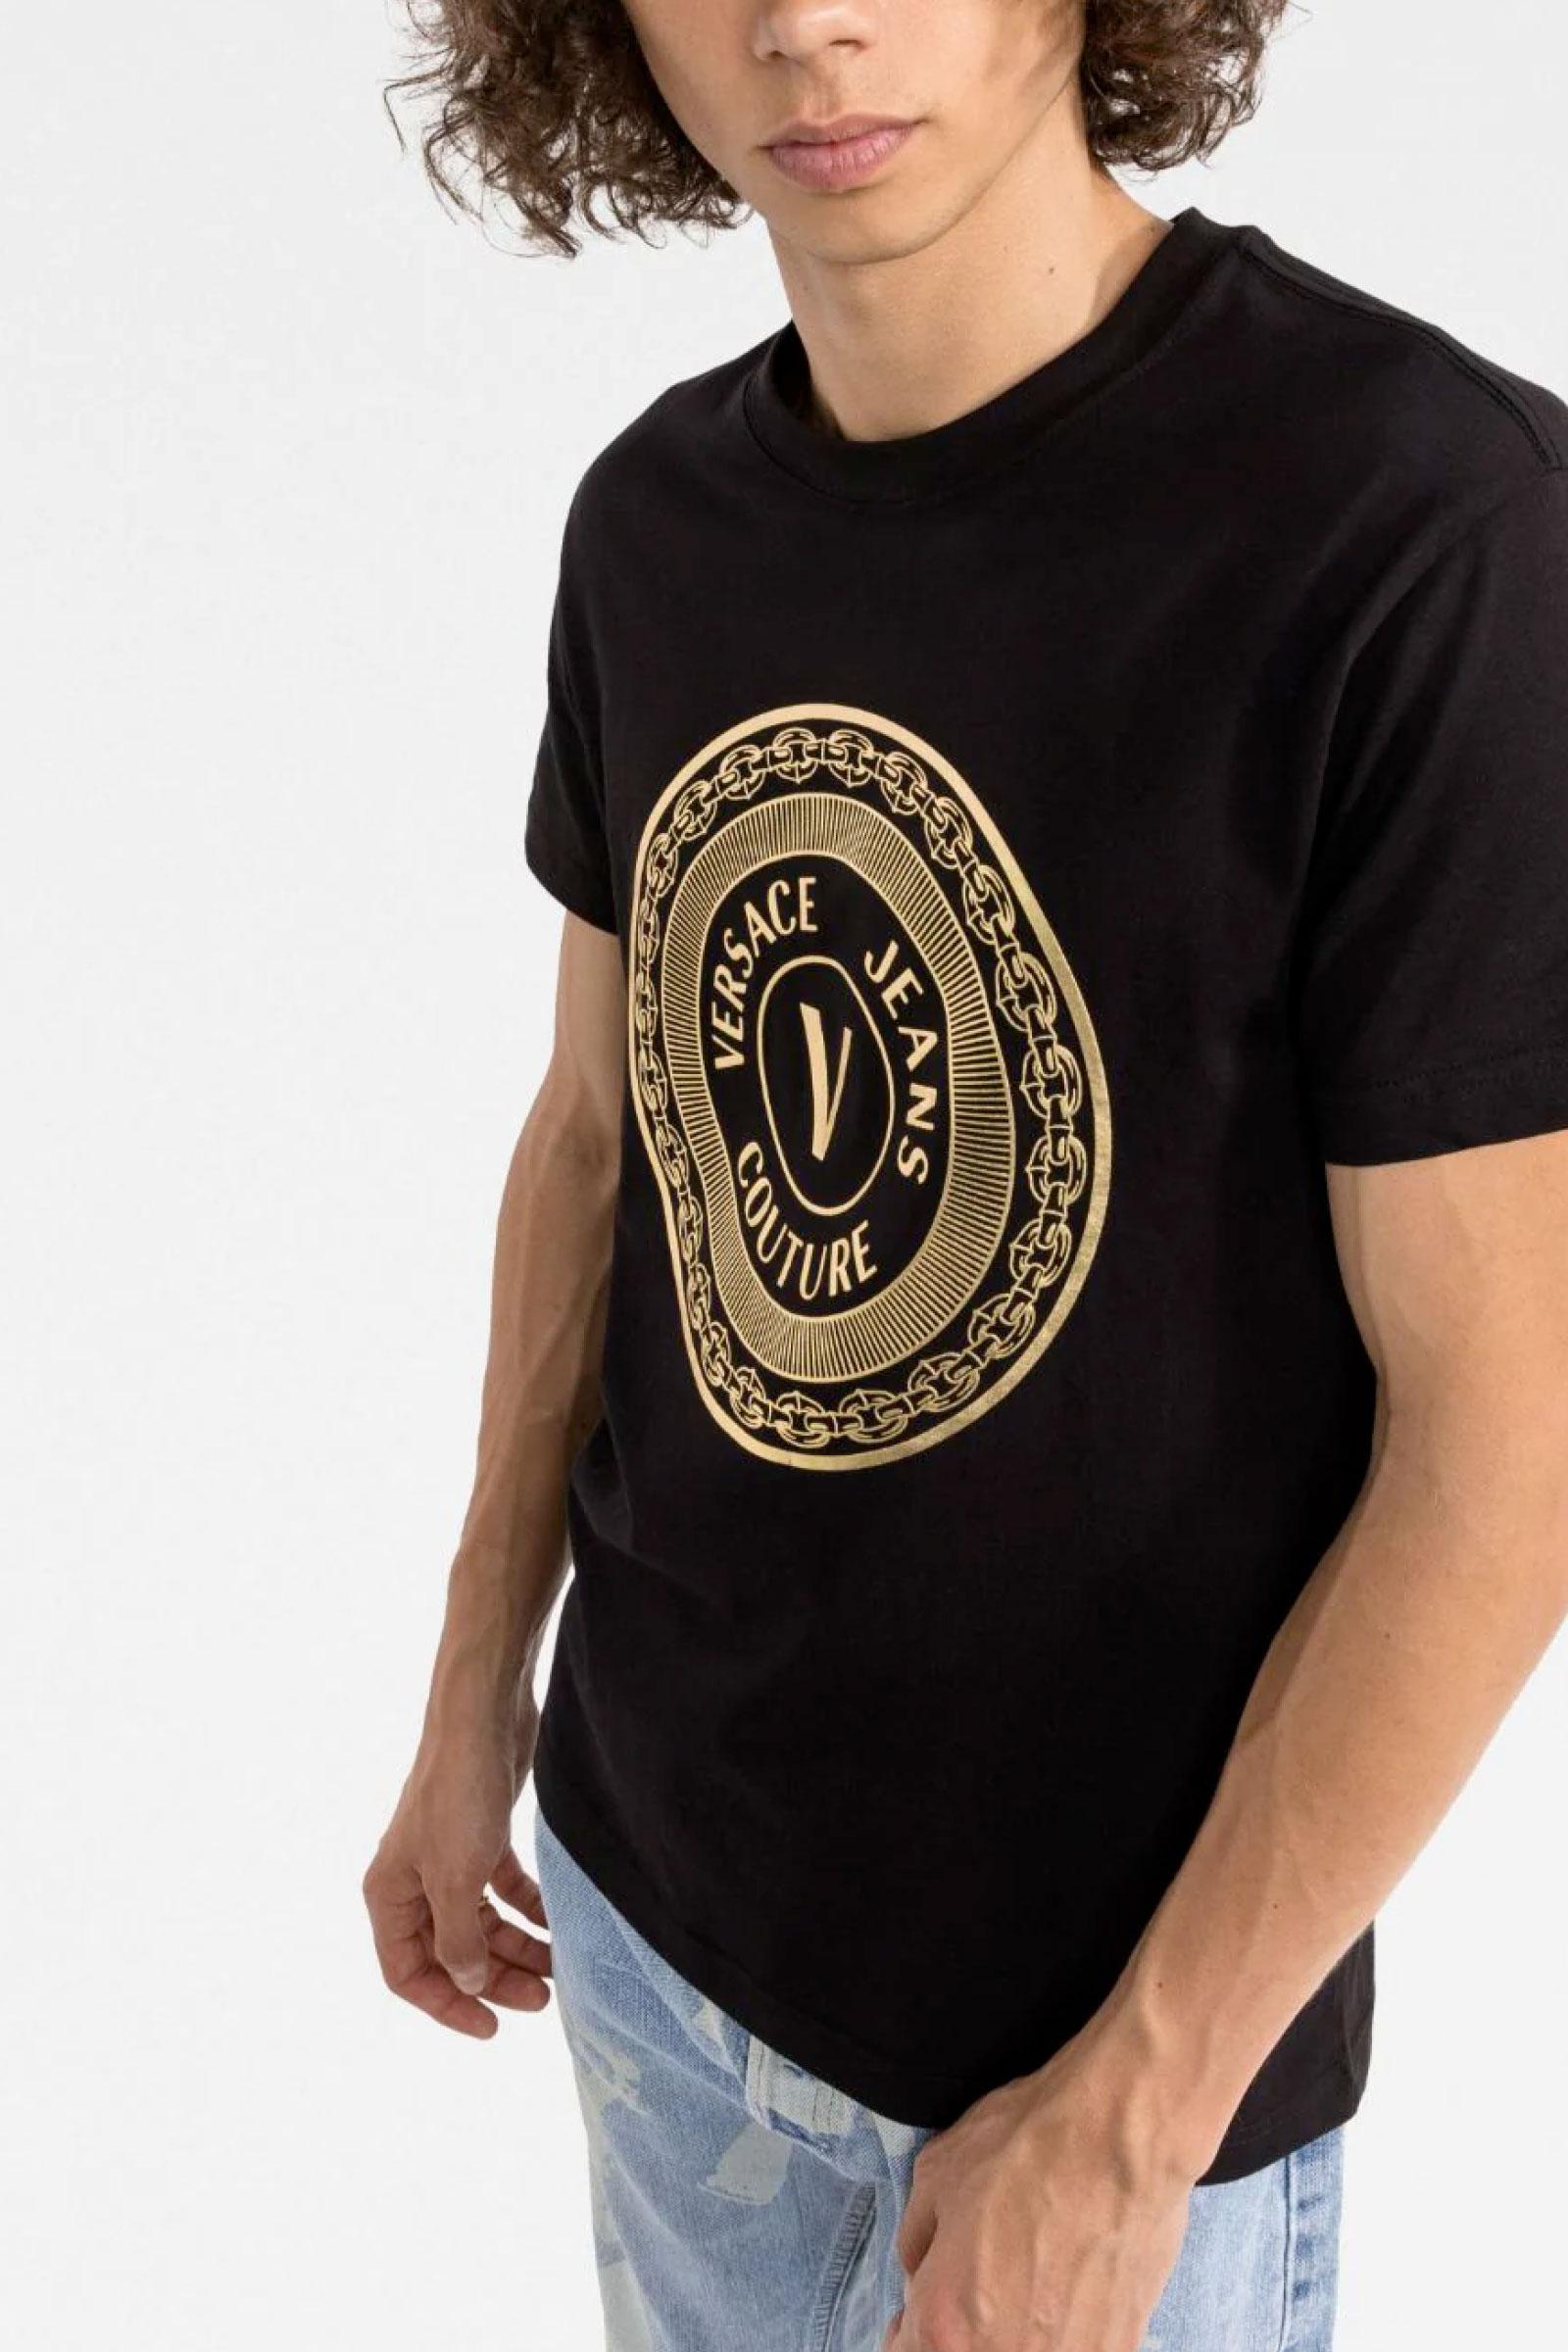 VERSACE JEANS COUTURE   T-Shirt   71GAHT12 CJ00TG89